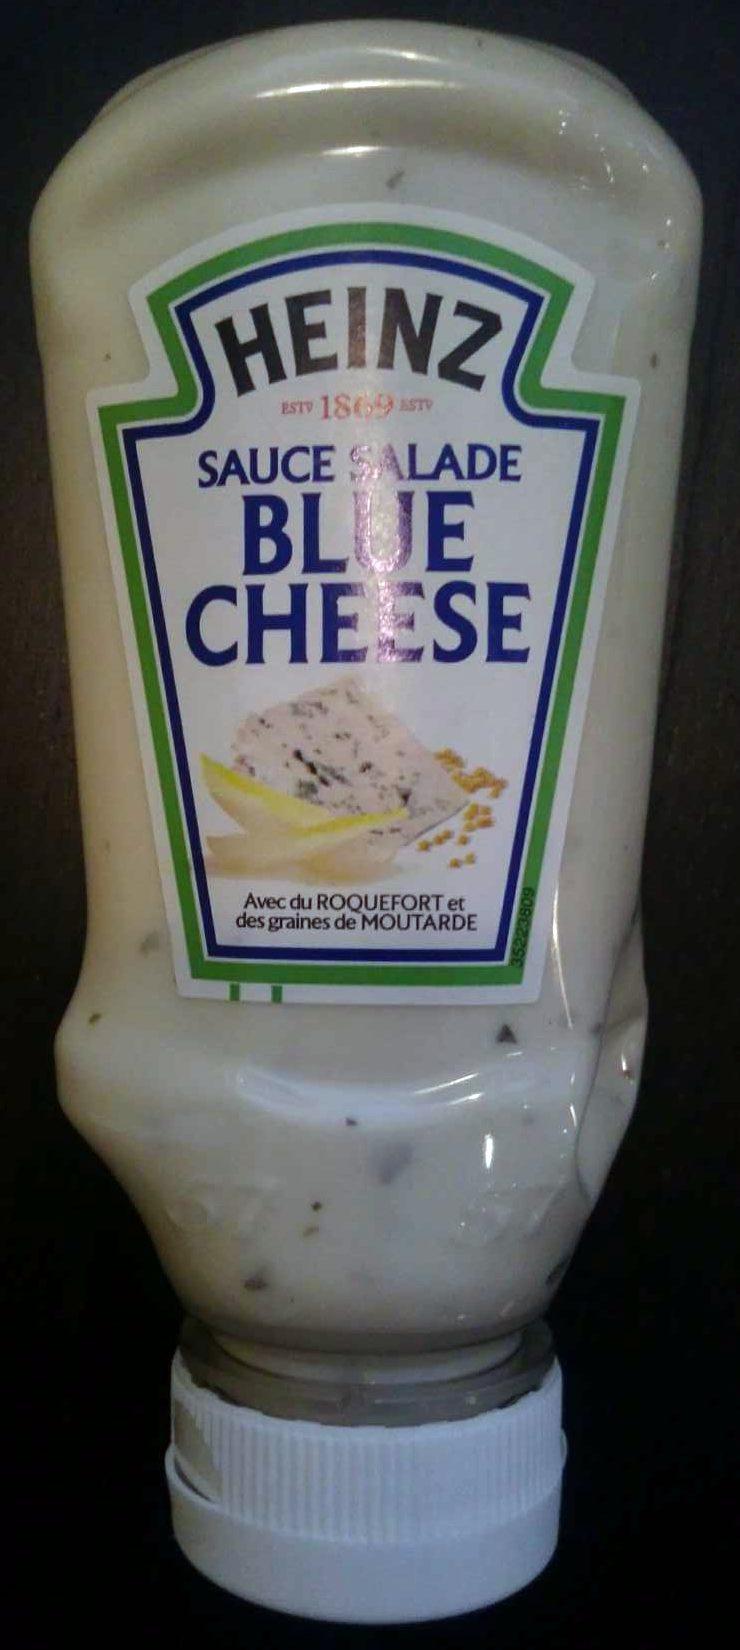 Sauce salade bleu cheese - Produit - fr